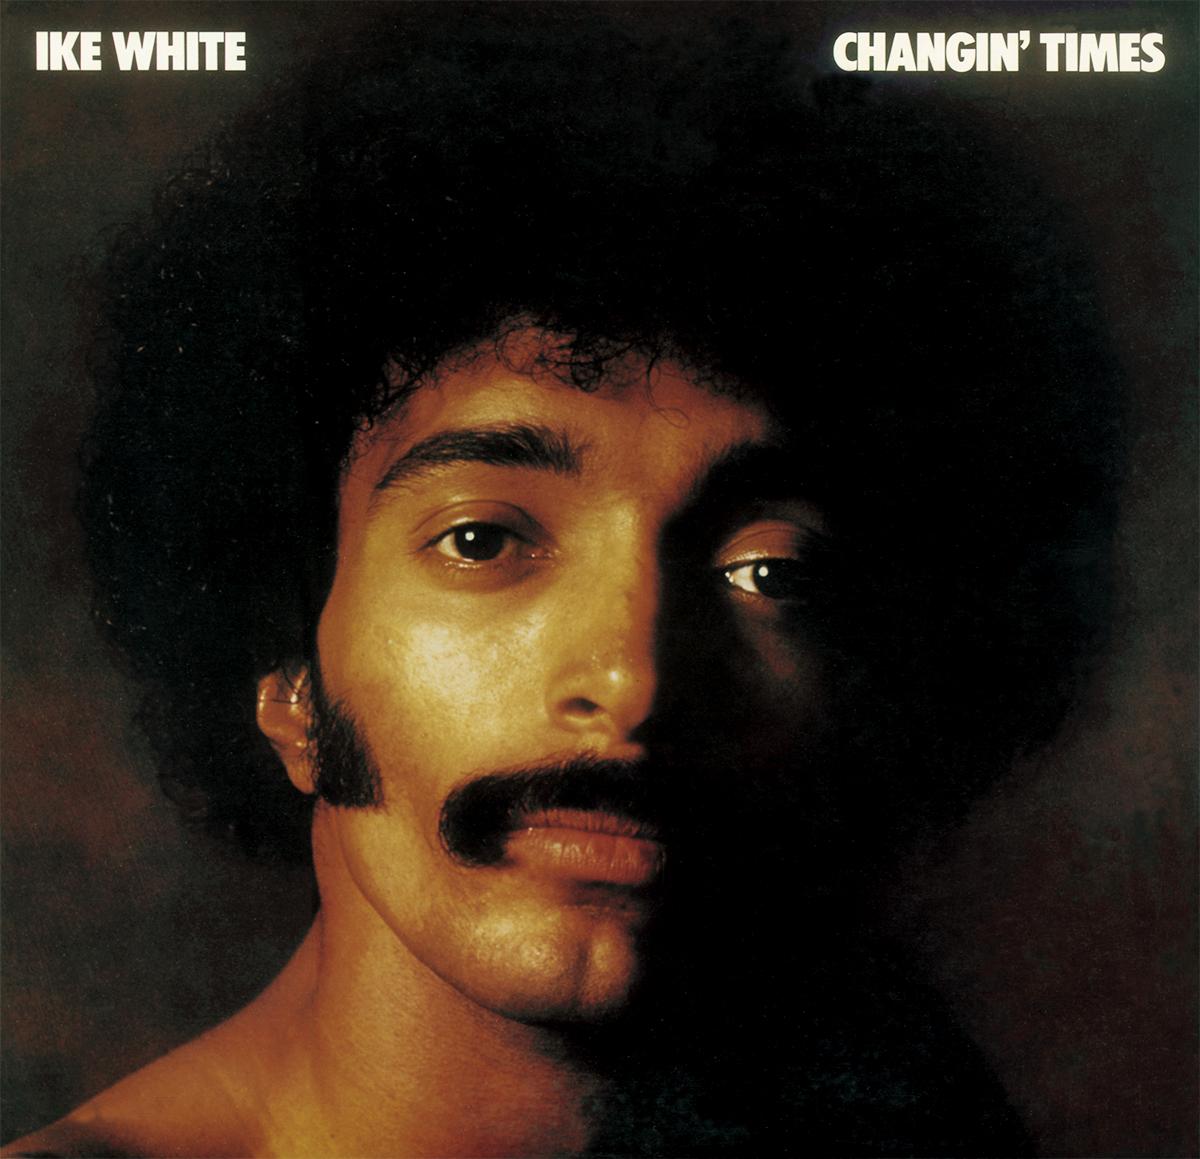 018_Ike WhiteChangin' Times